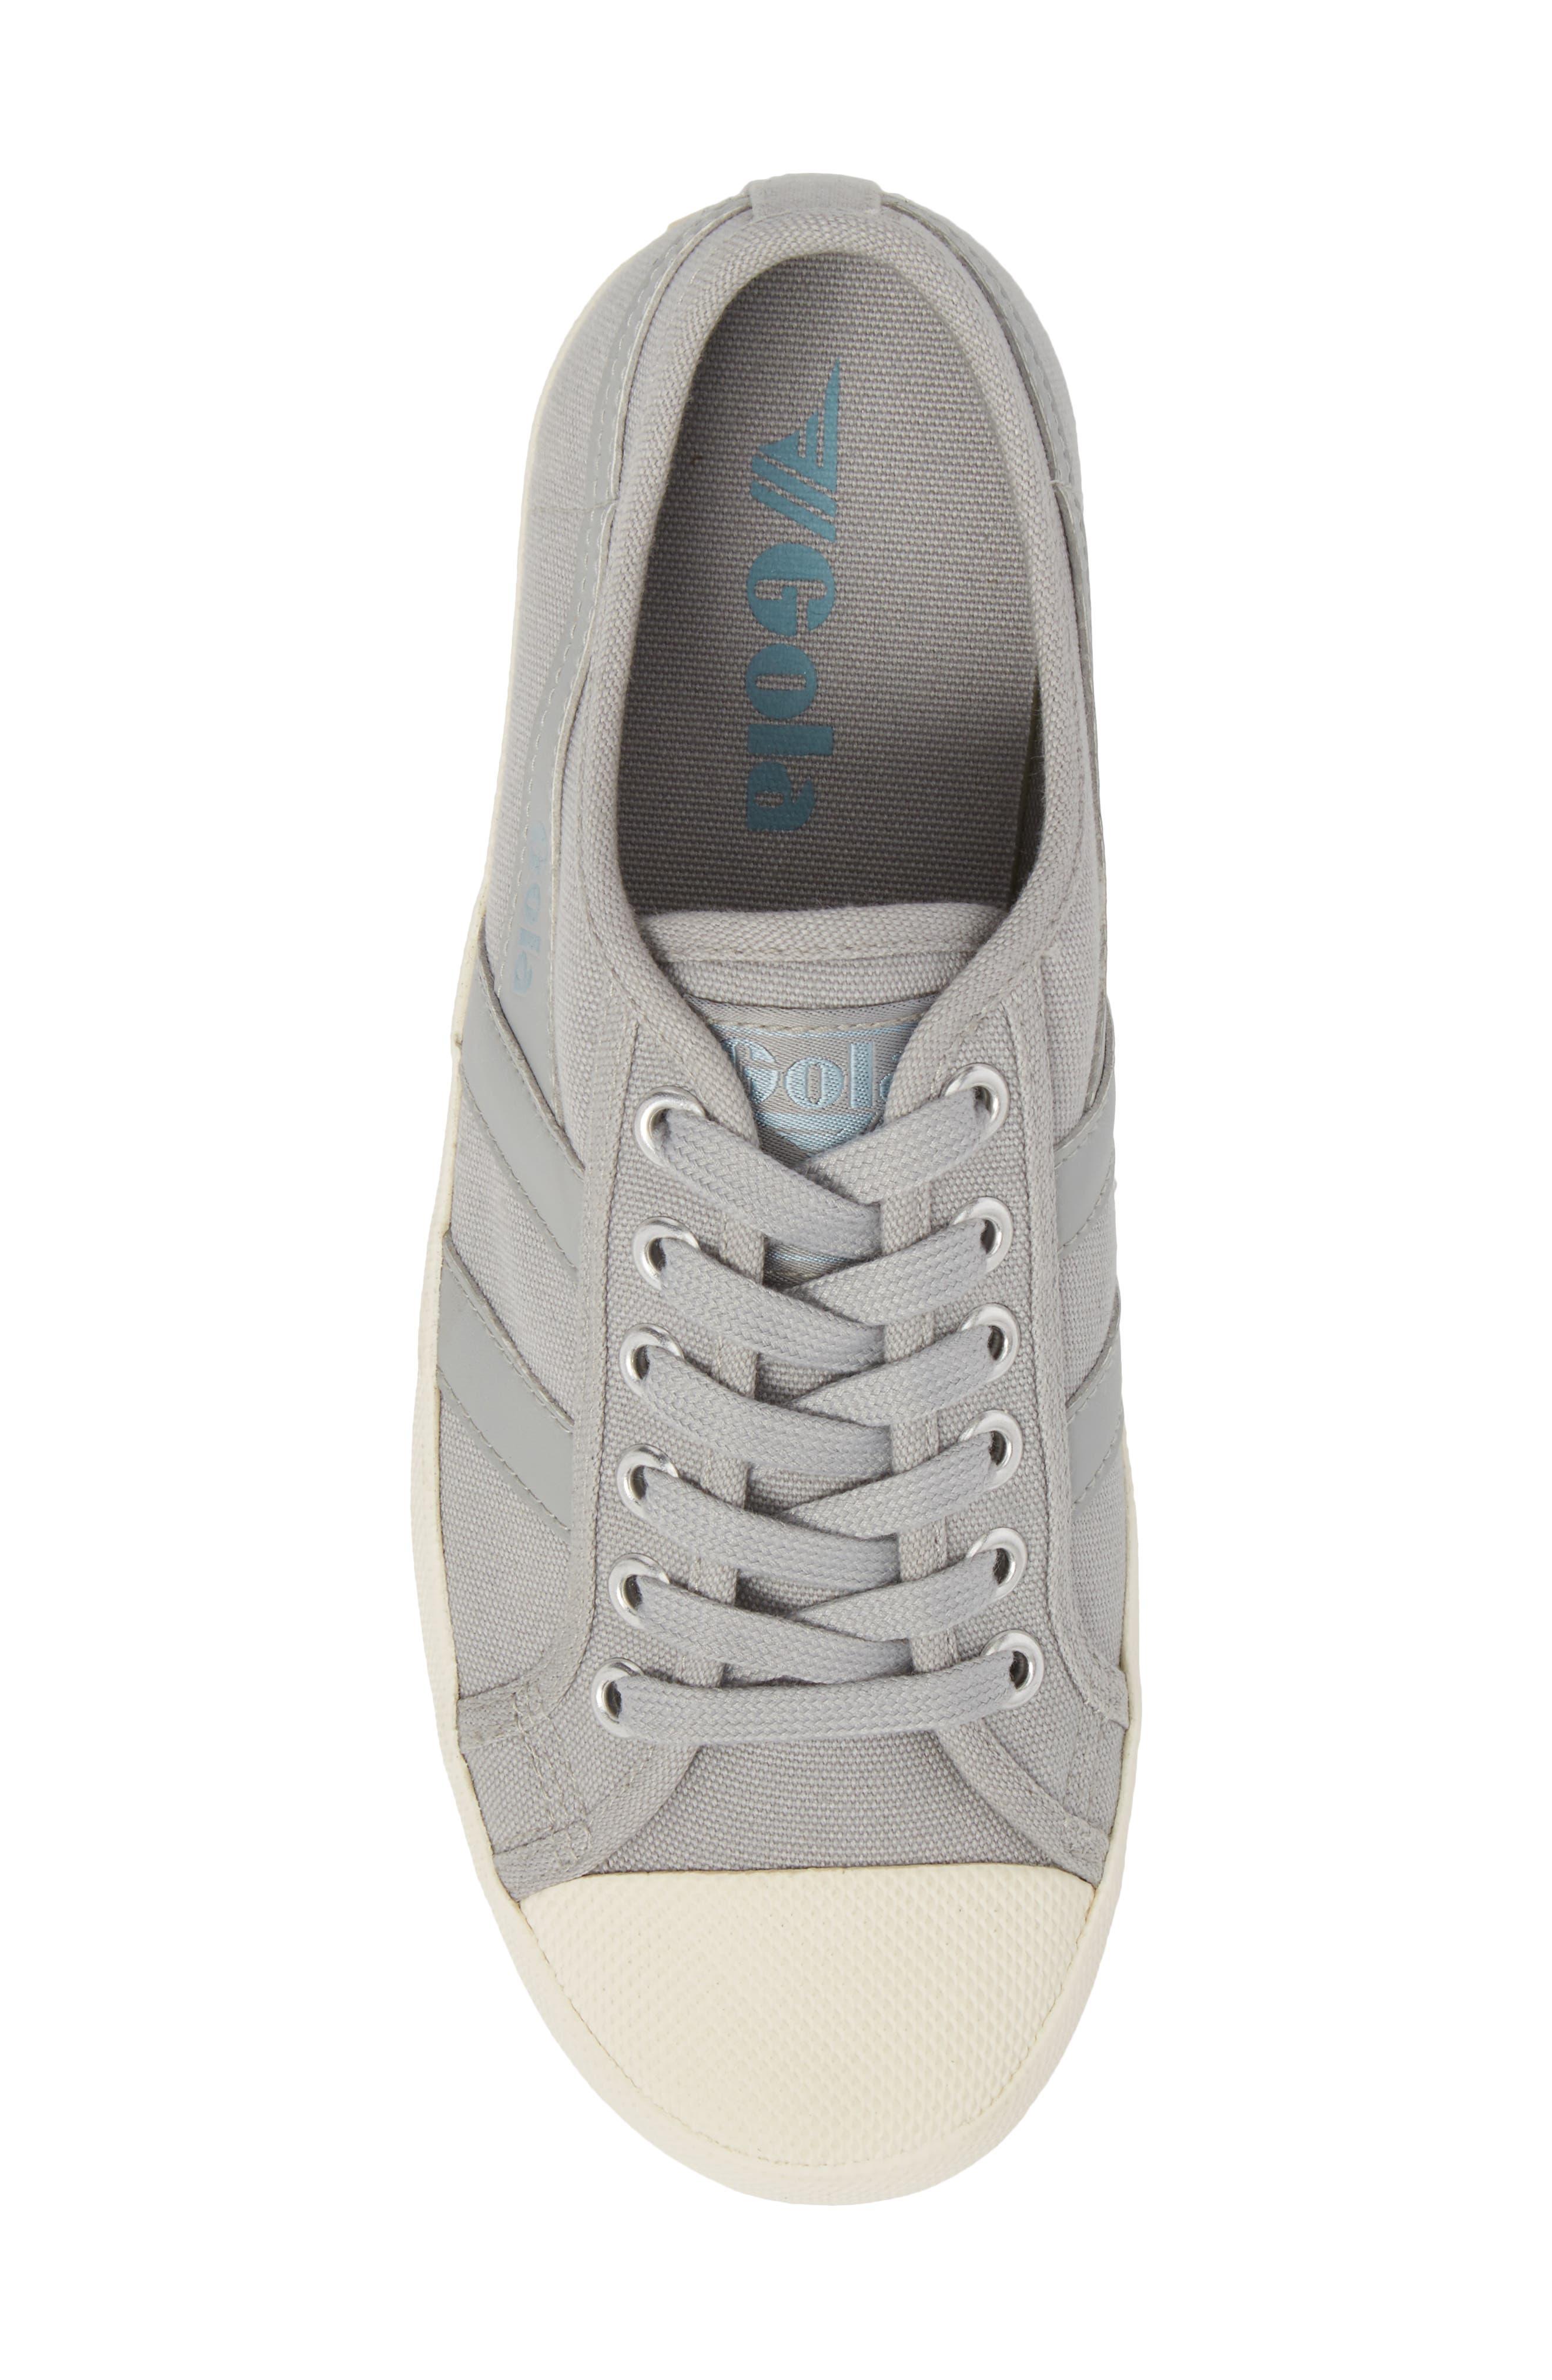 Coaster Sneaker,                             Alternate thumbnail 5, color,                             Paloma/ Off White